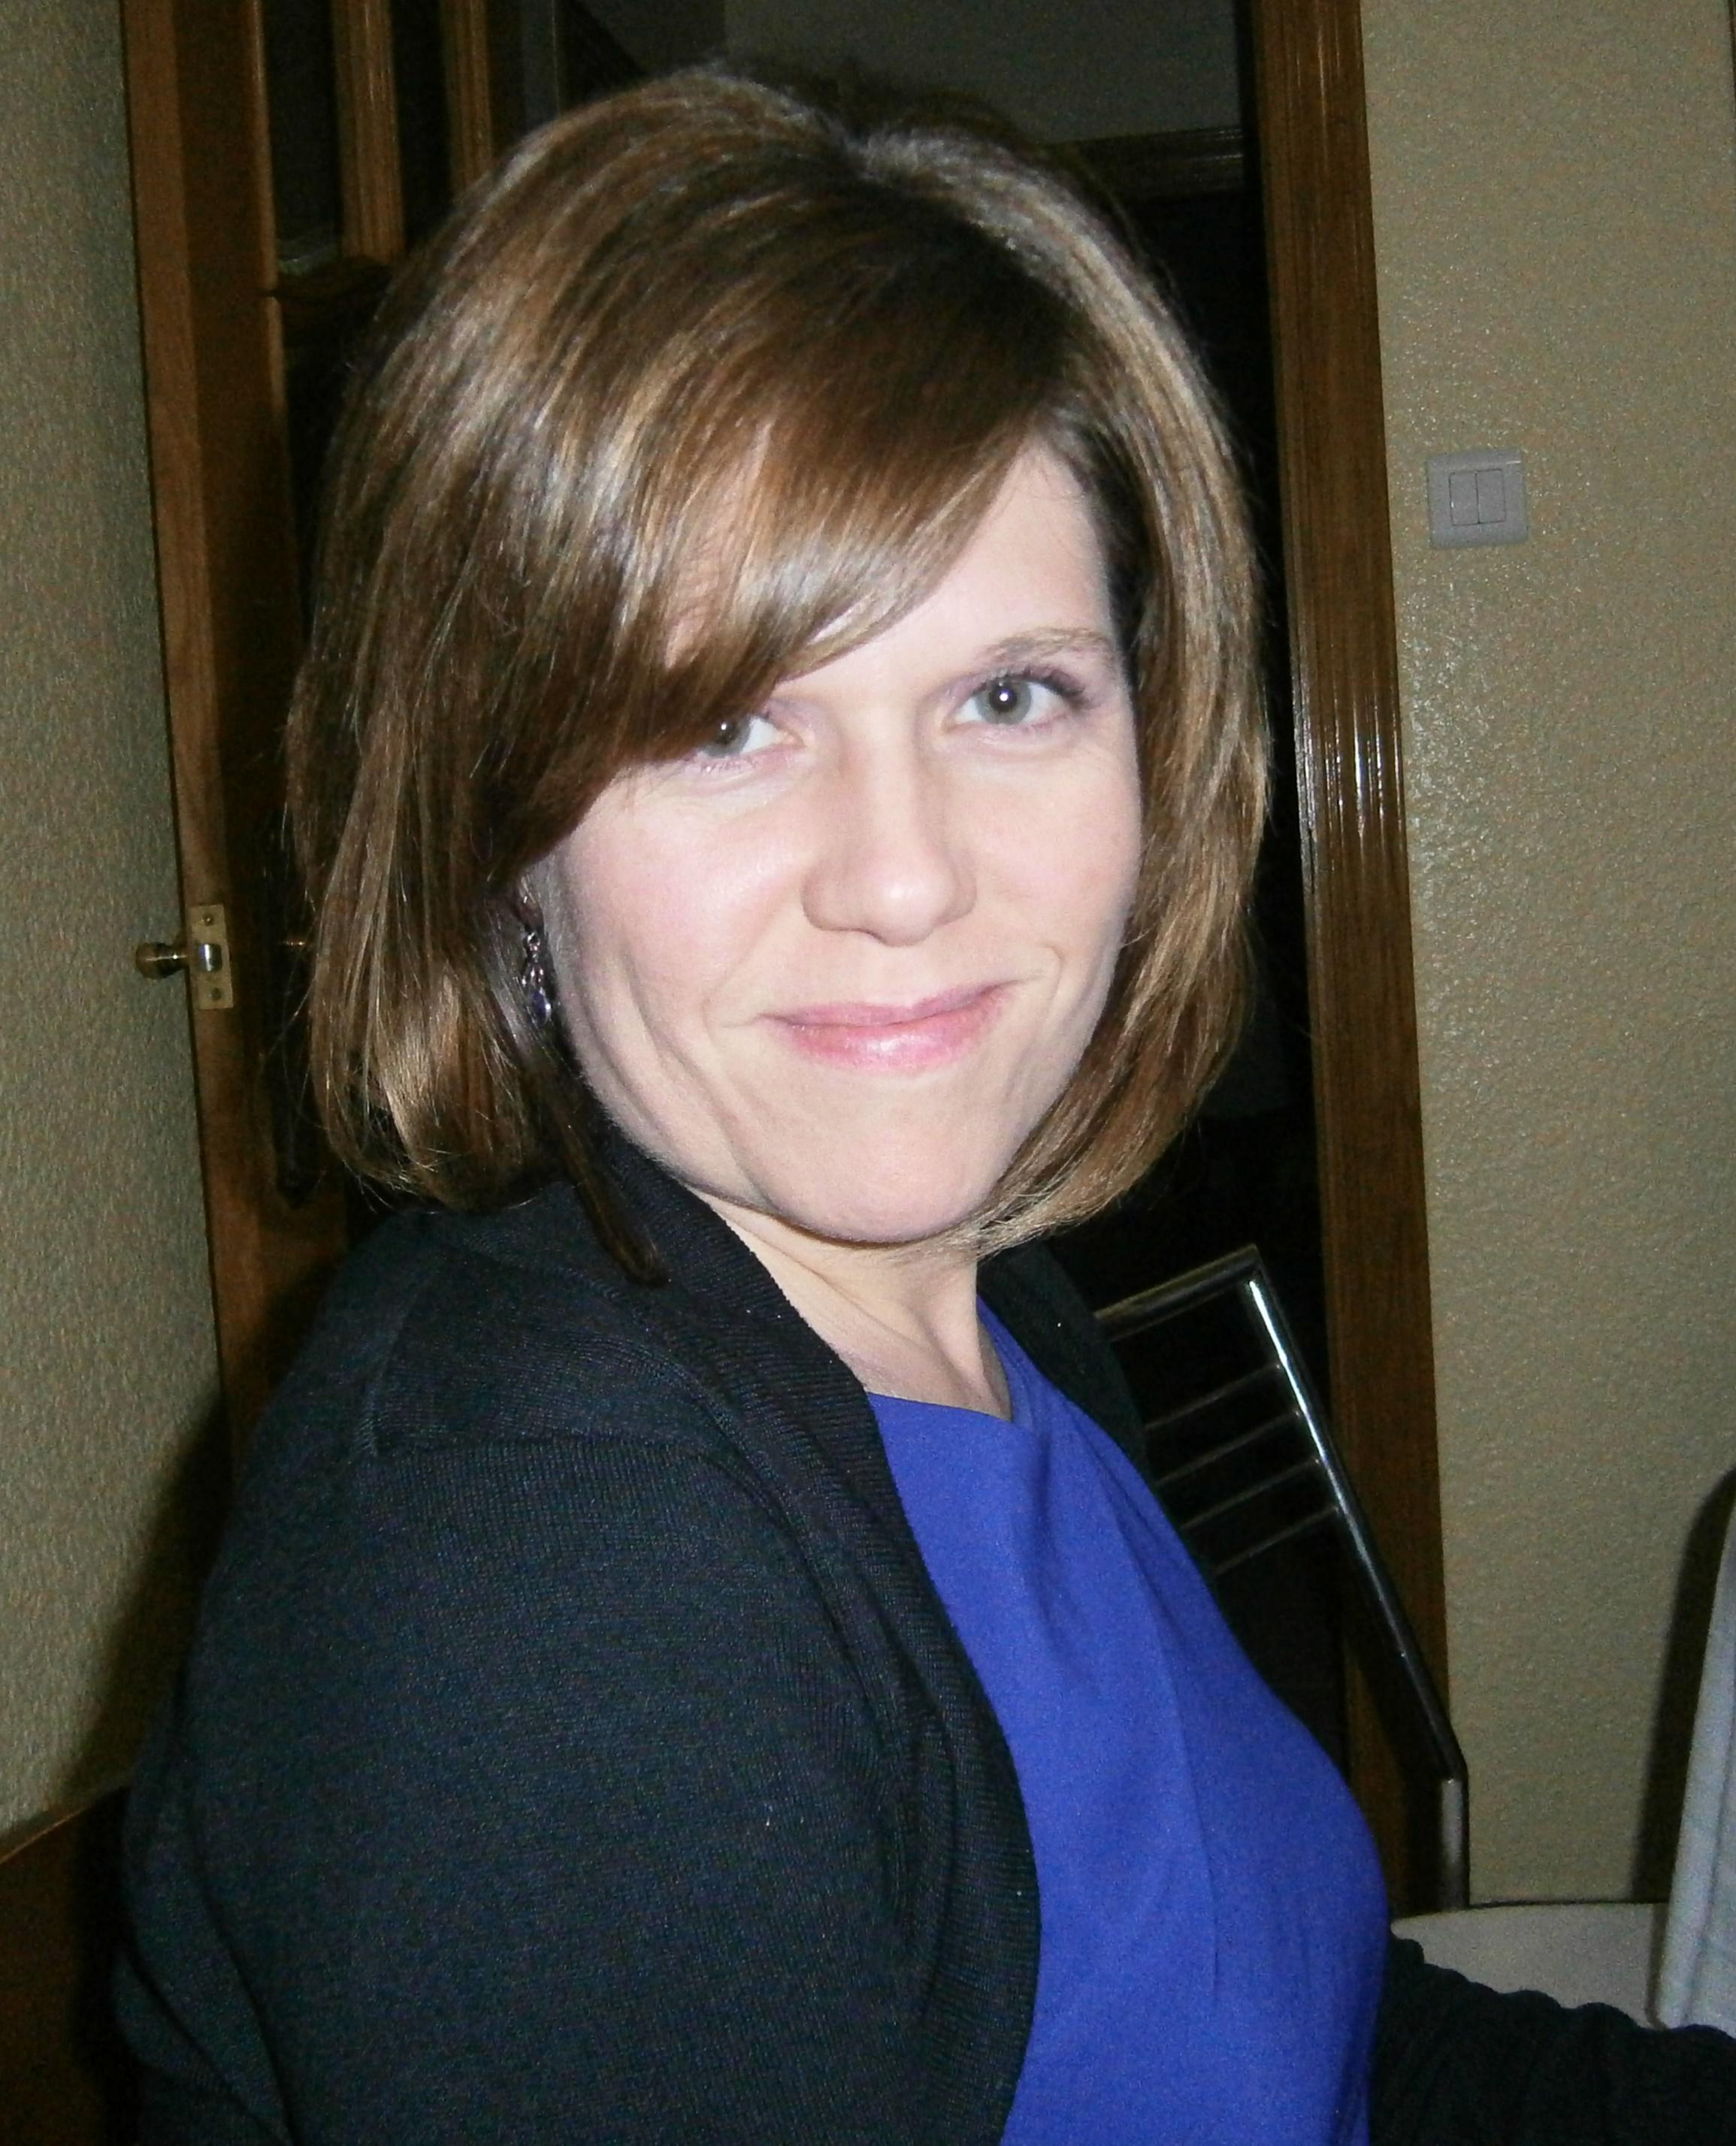 Eva Lara es profesora de la Universidad Católica de Valencia.